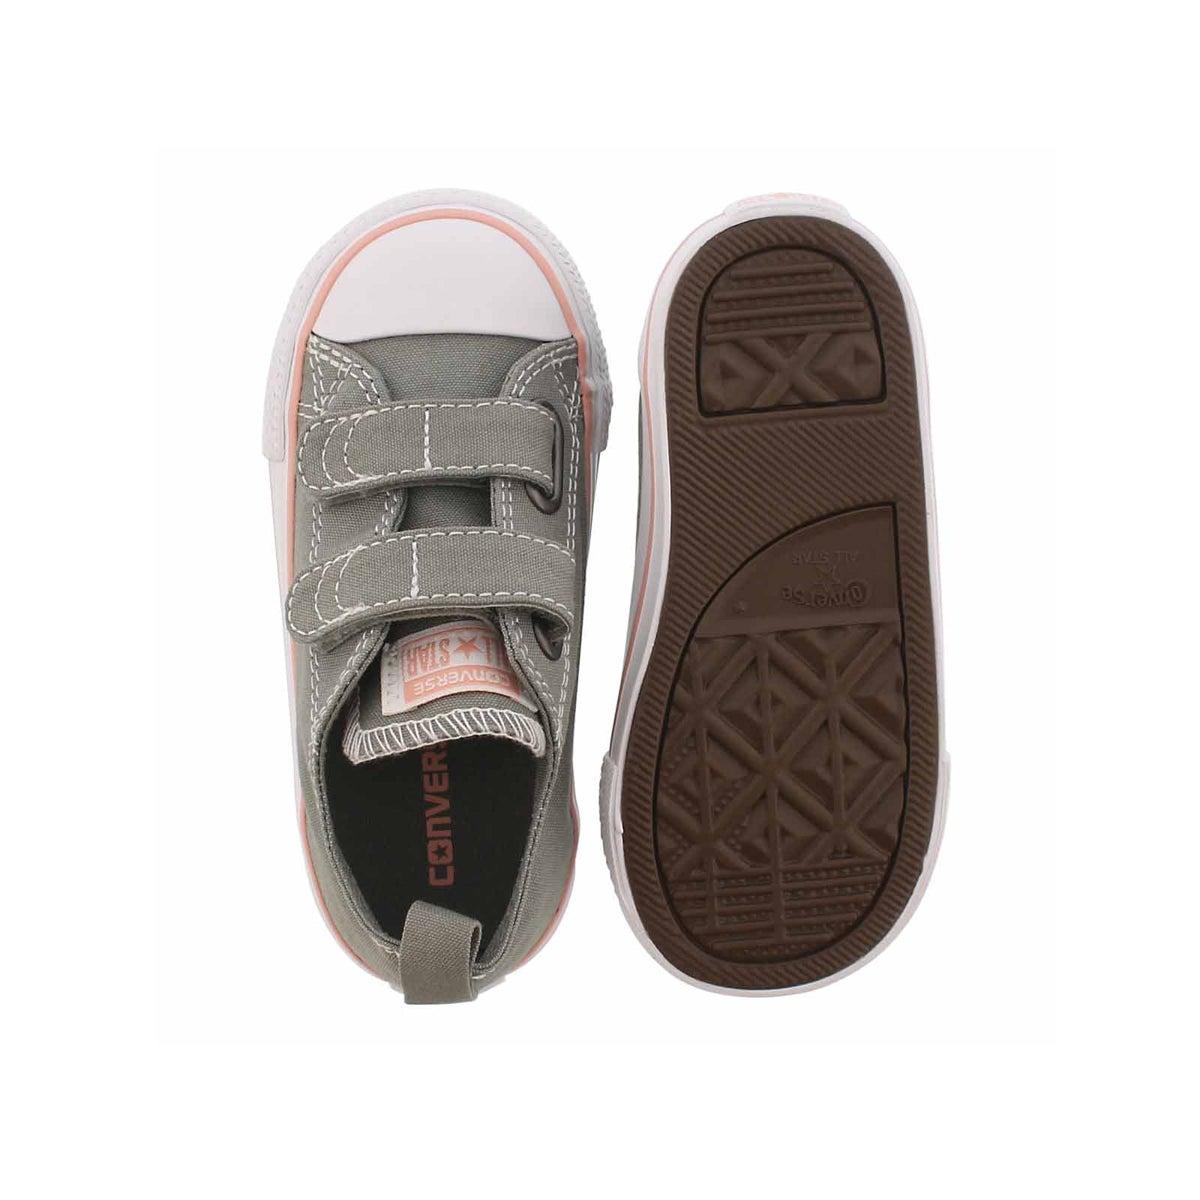 Infs-g CTAS 2V stucco/coral sneaker